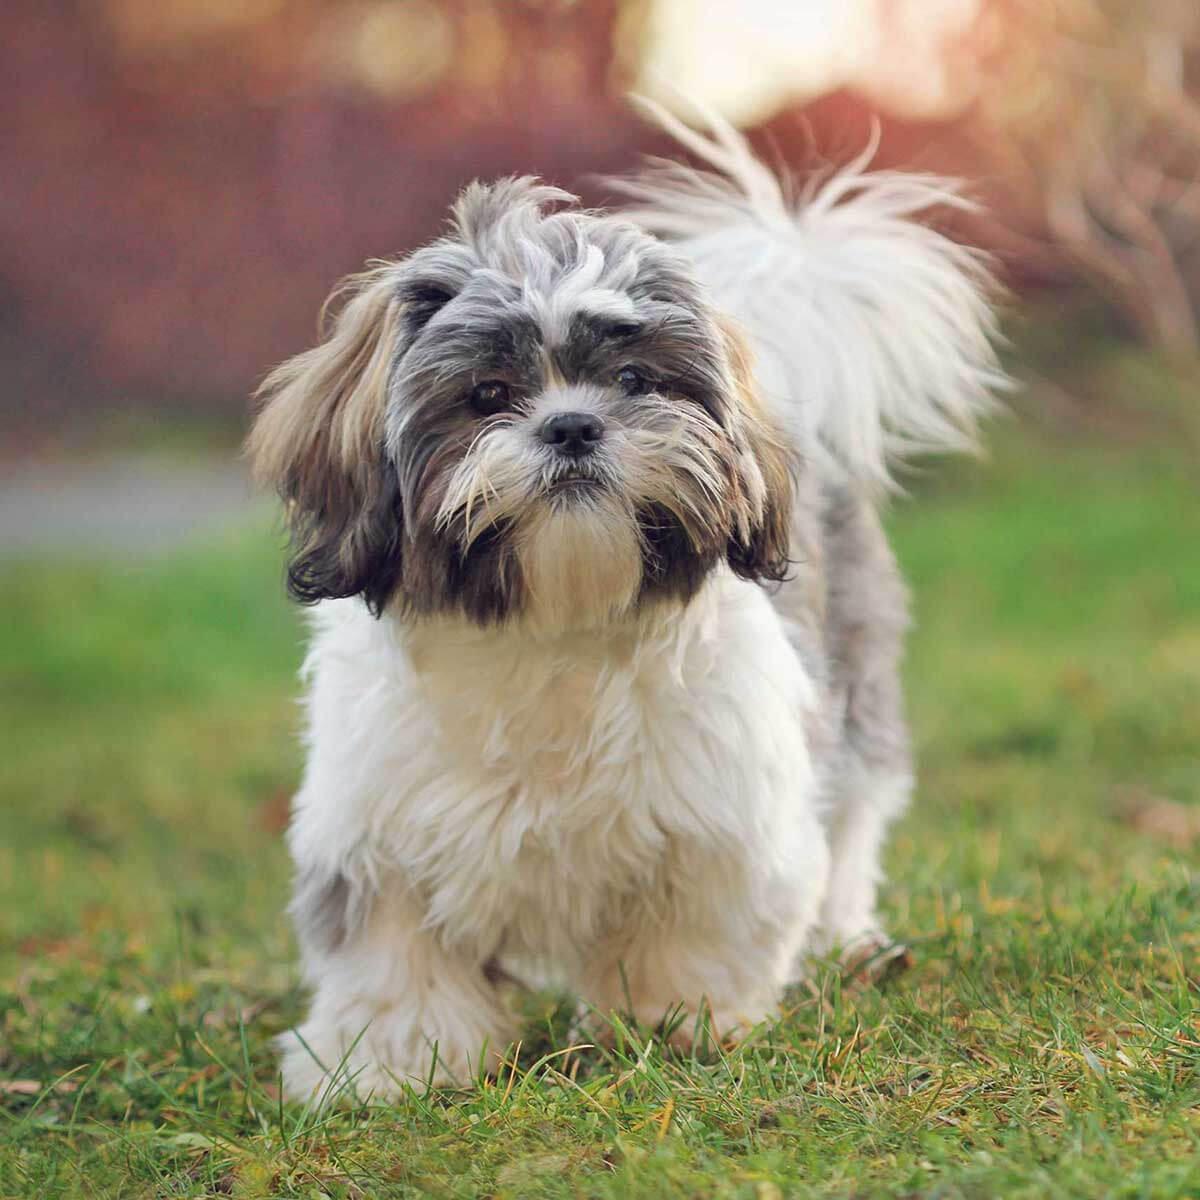 shih-tzu-dog-breed